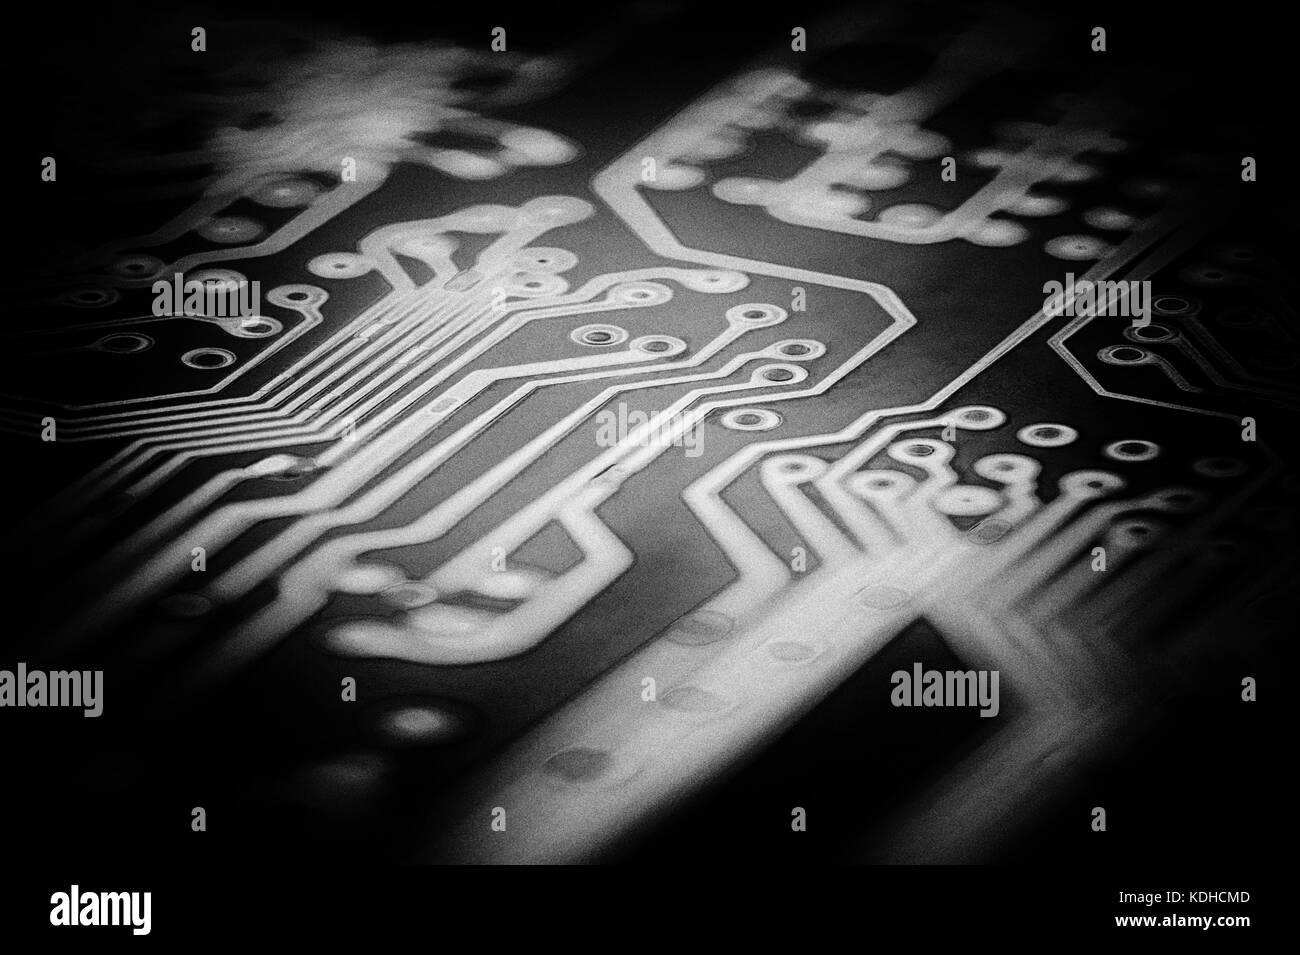 Computer Circuitry Stock Photo: 163267005 - Alamy